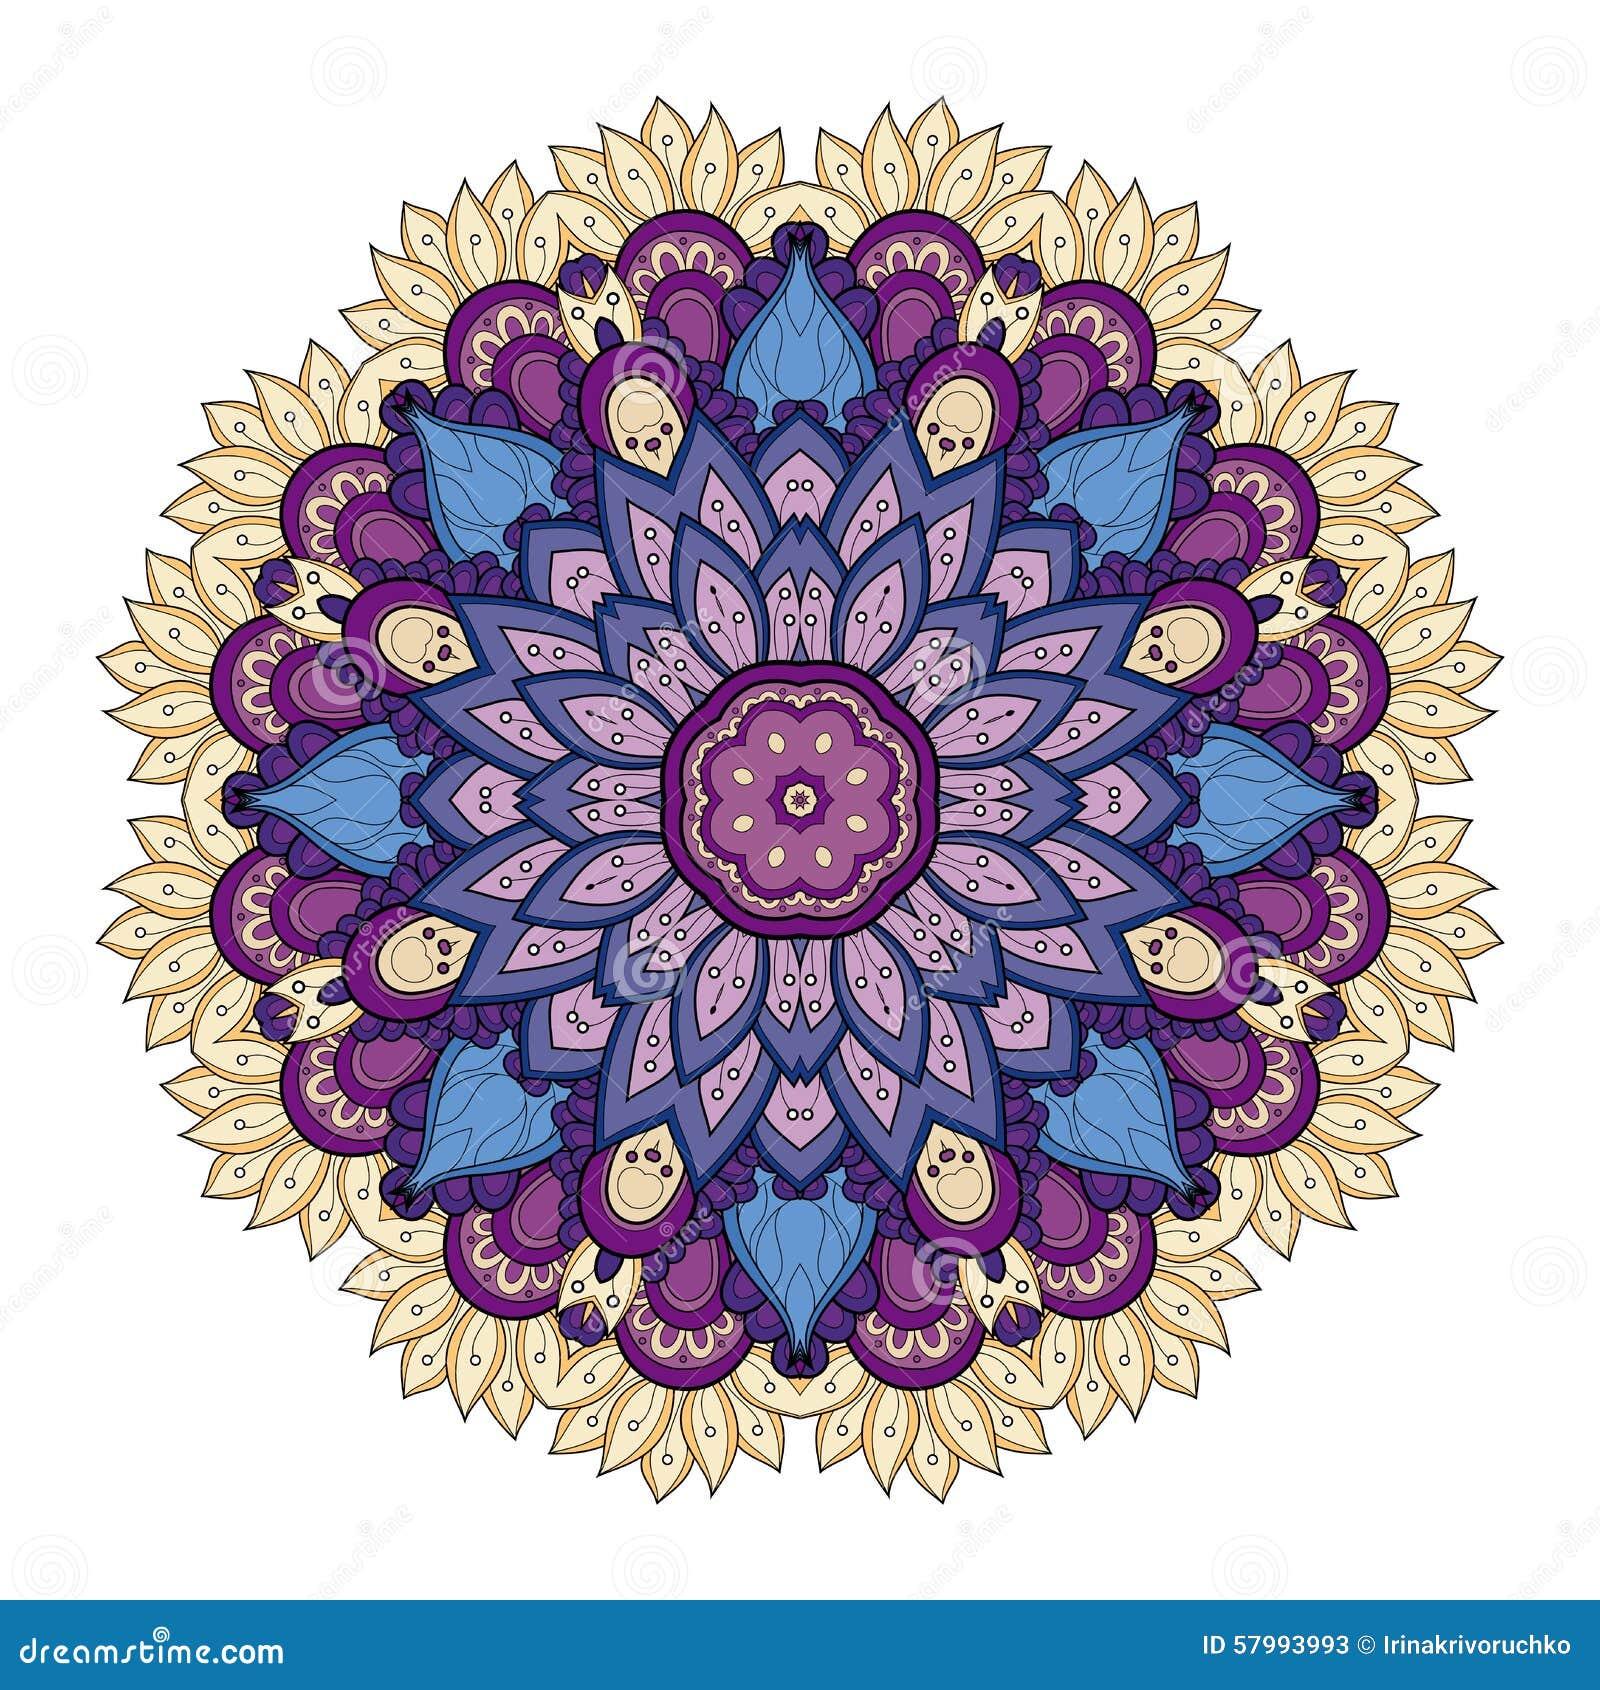 hermoso dibujos de mandalas coloreadas